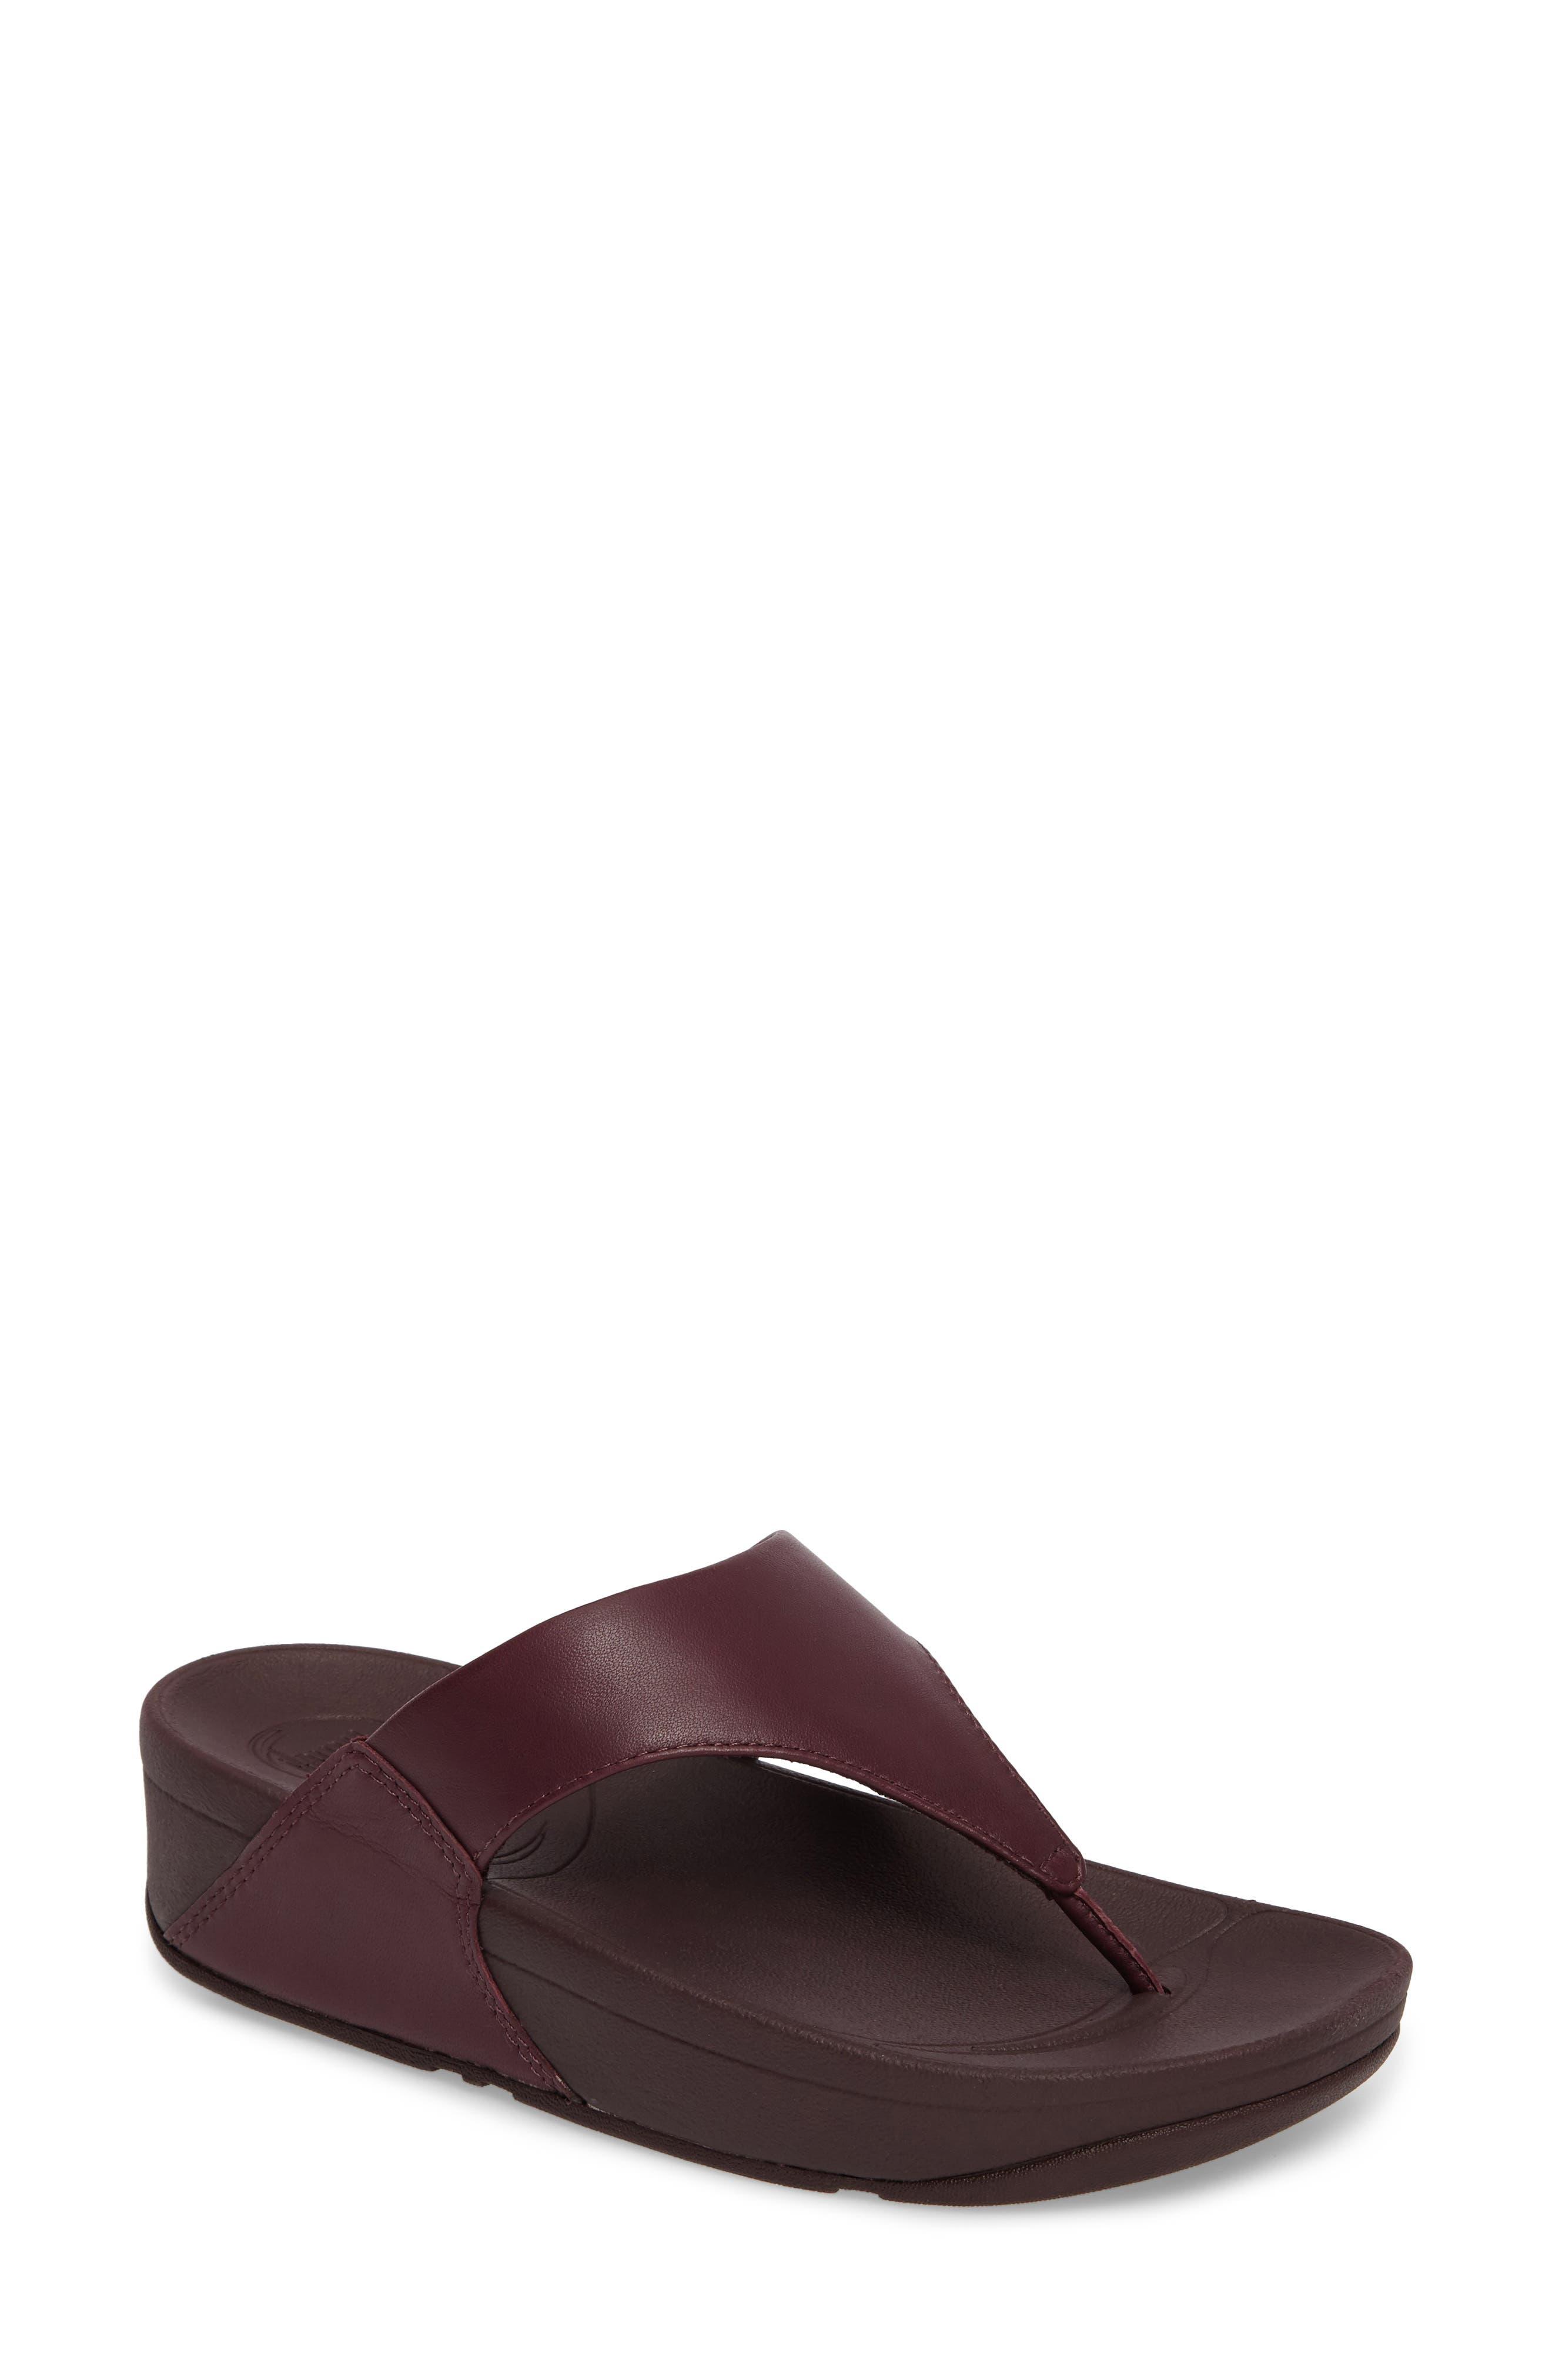 Lulu Sandal,                         Main,                         color, Deep Plum Leather